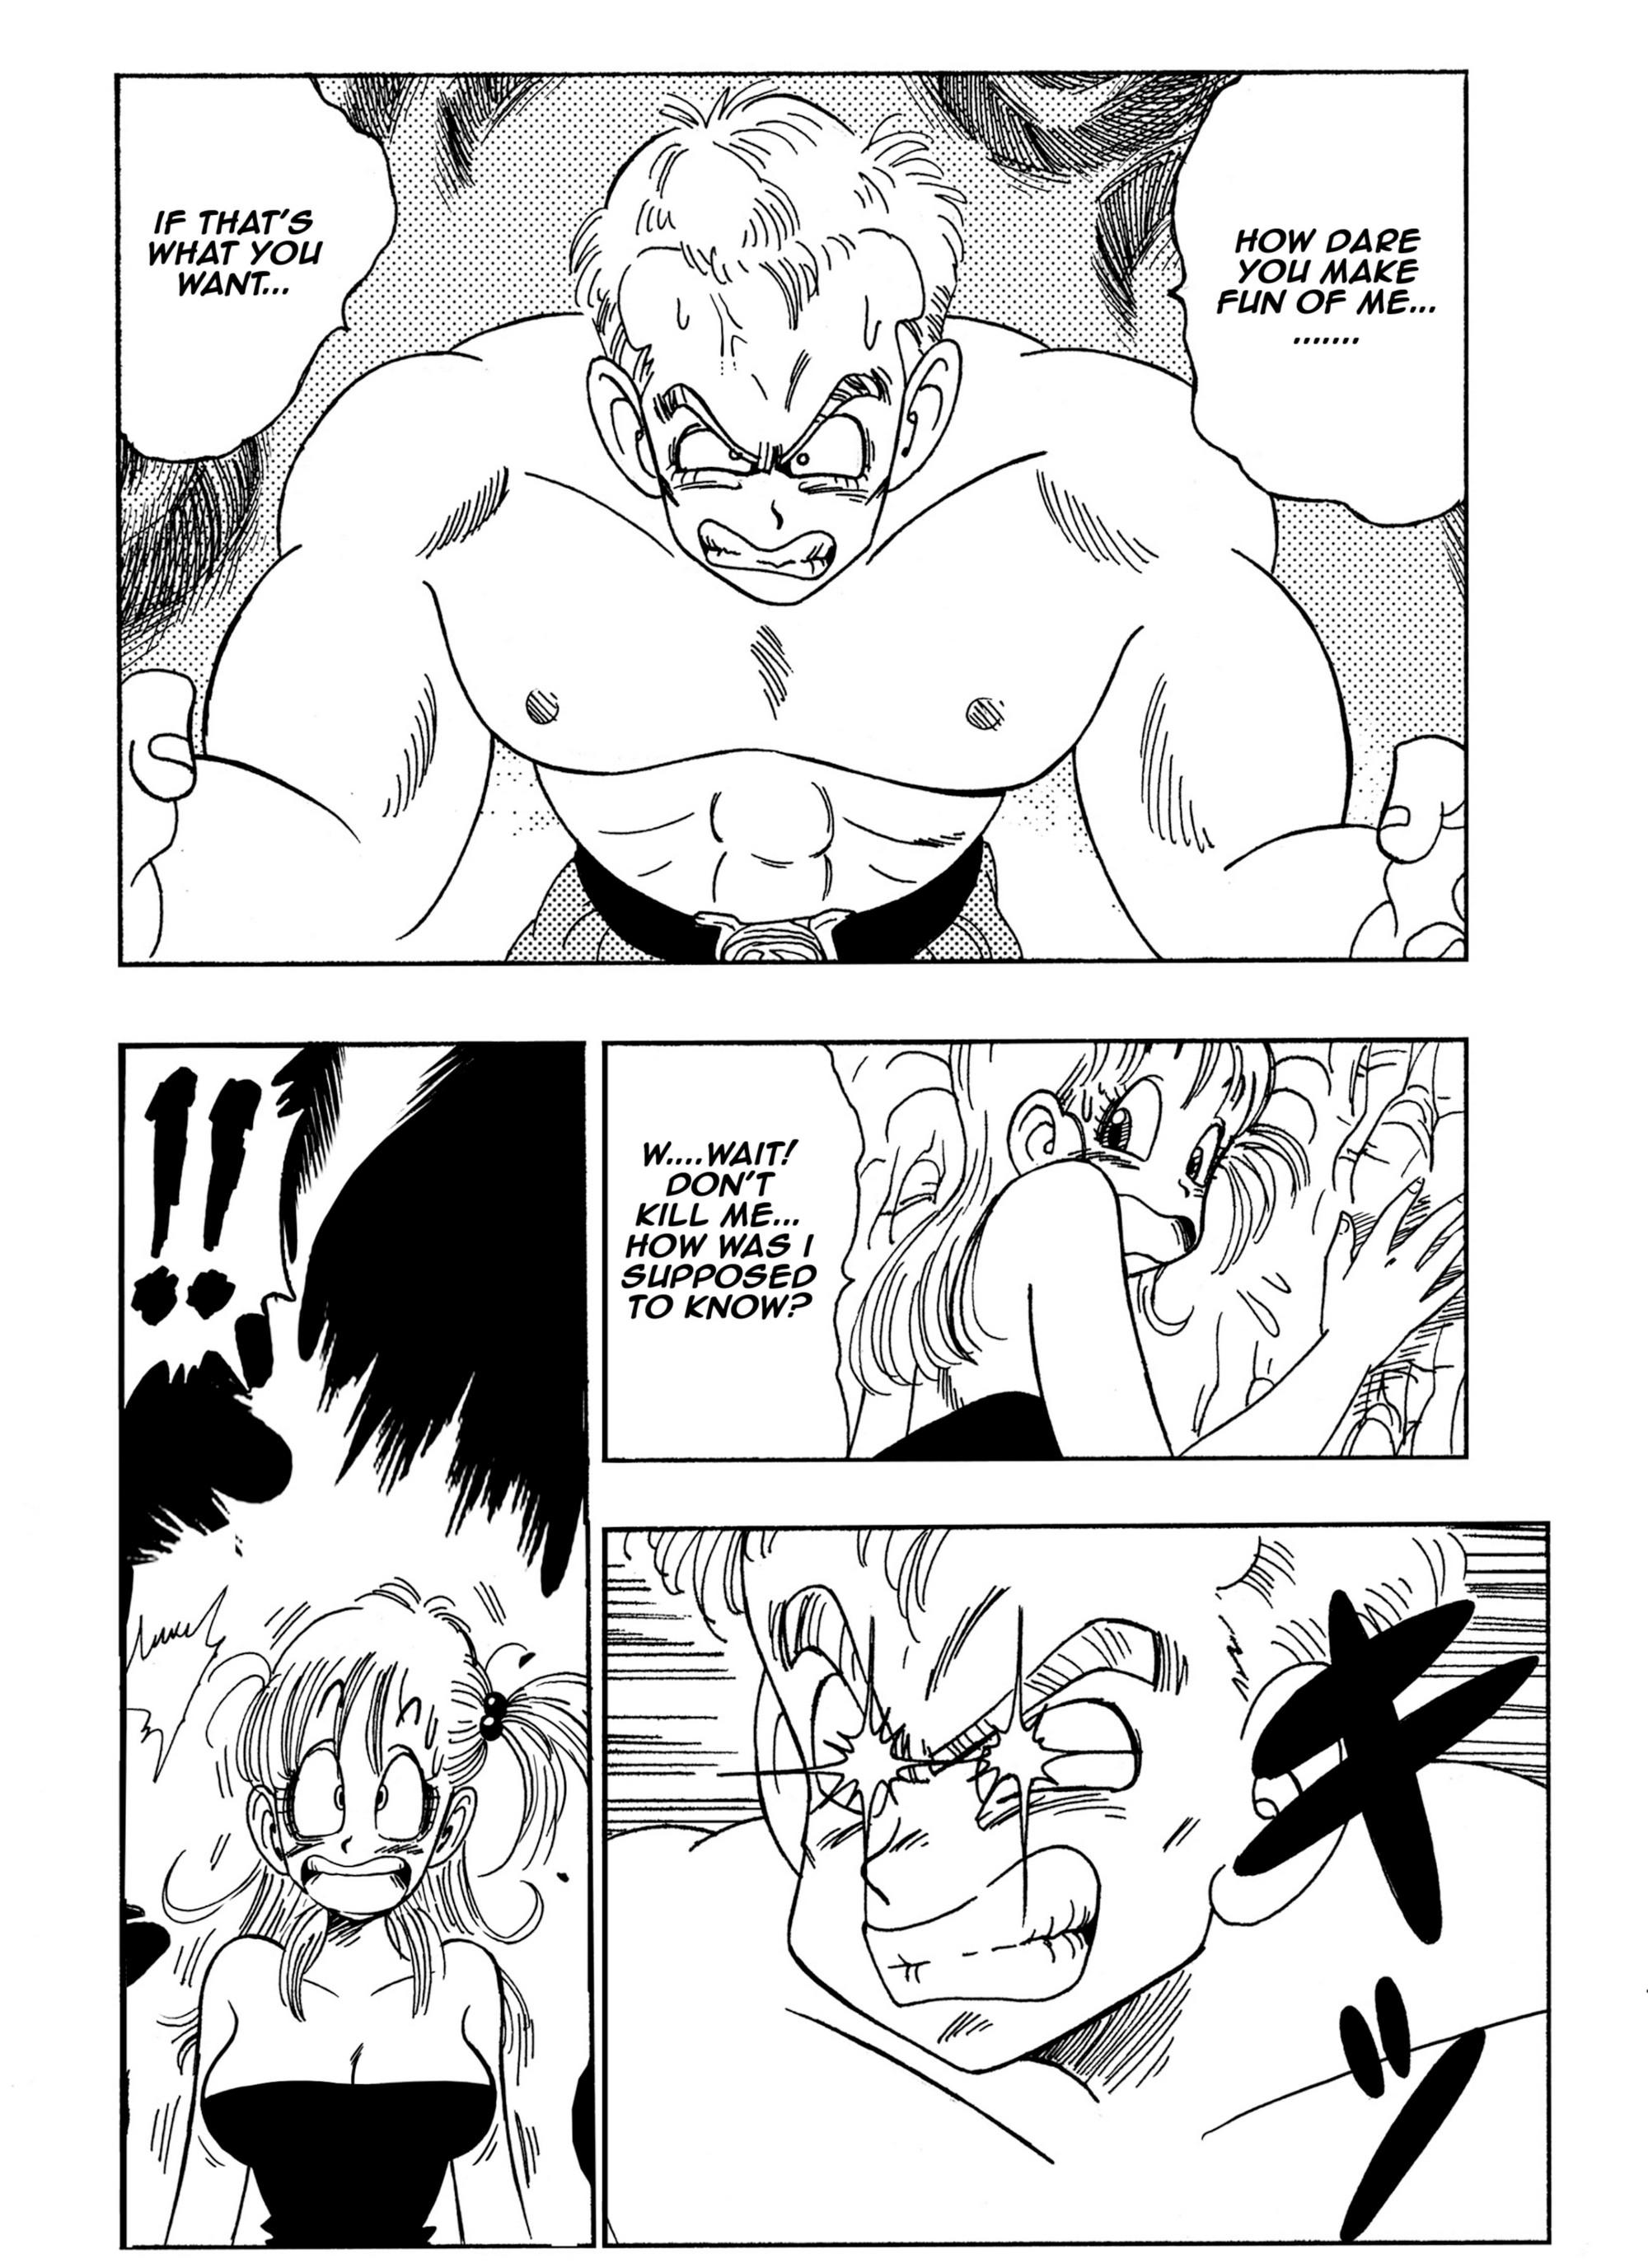 General Blue Vs Bulma Yamamoto 04